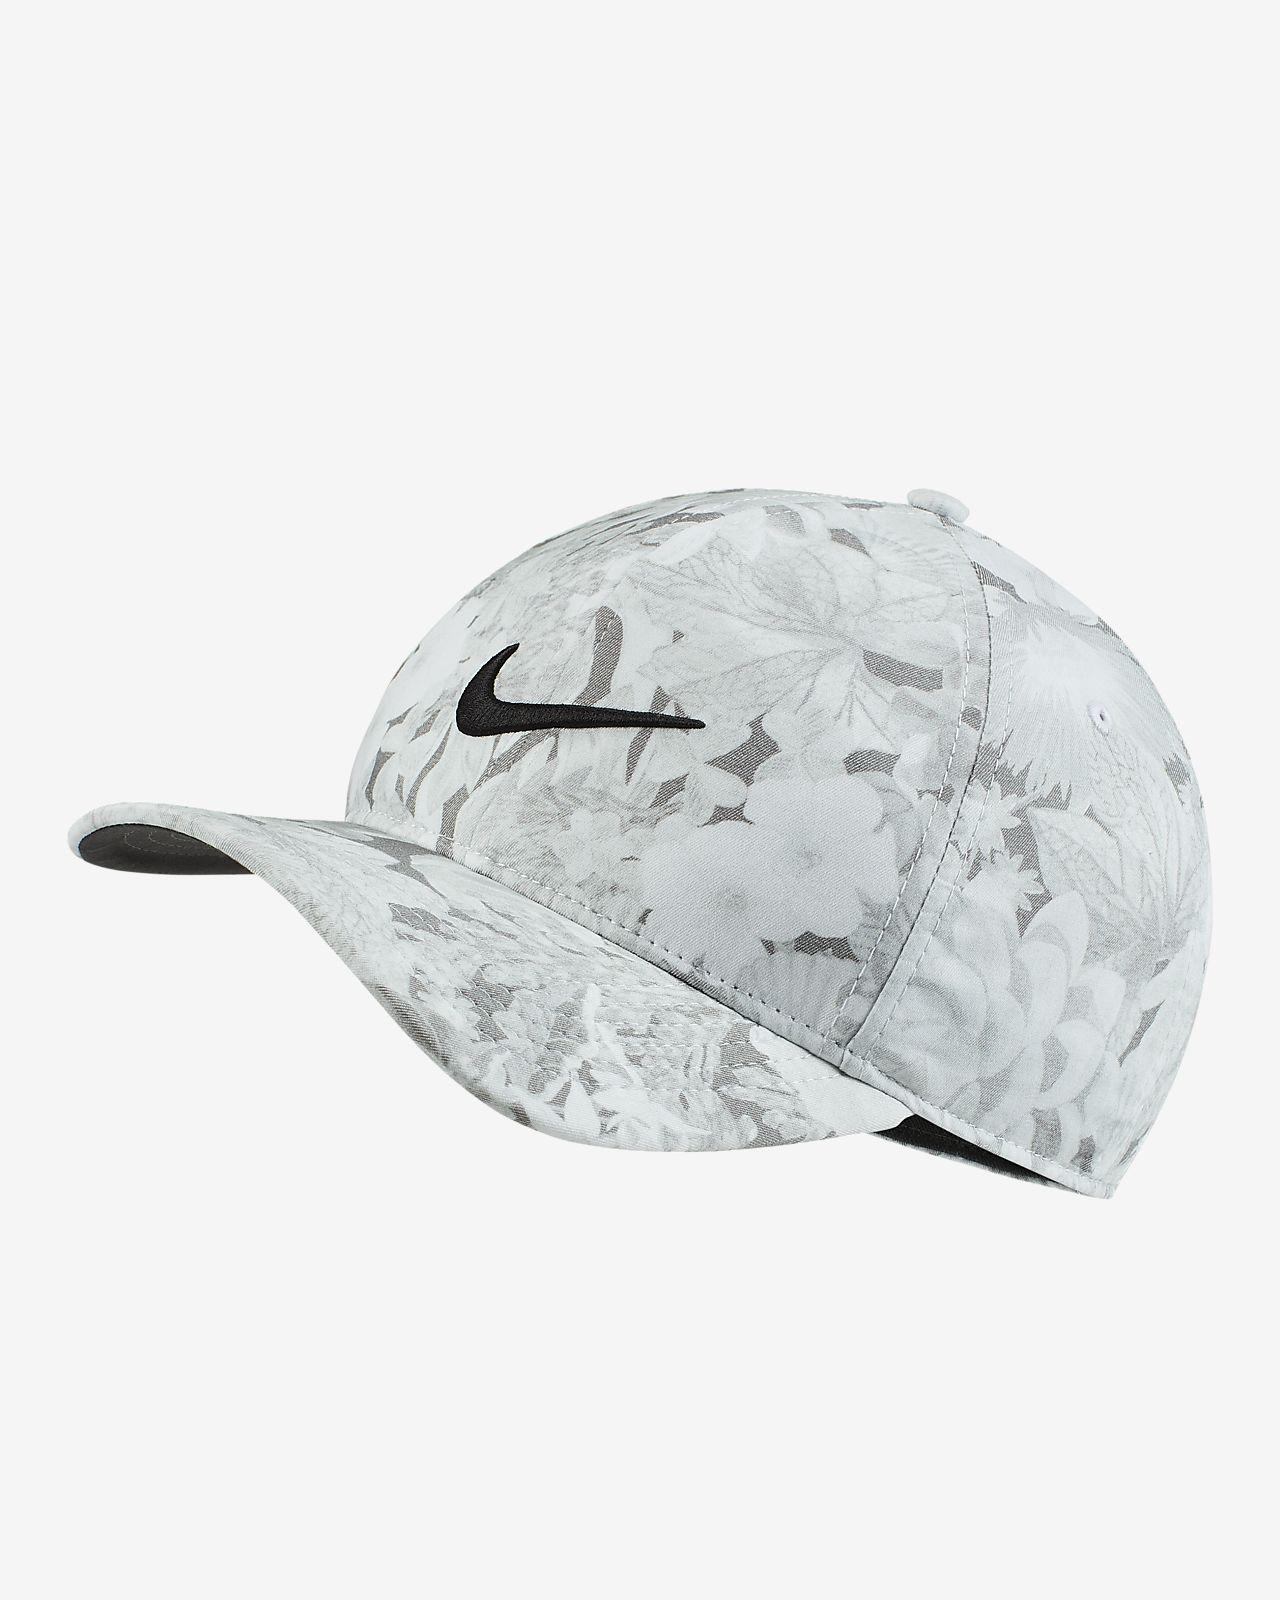 471ac58a2 Nike AeroBill Classic99 Printed Golf Hat